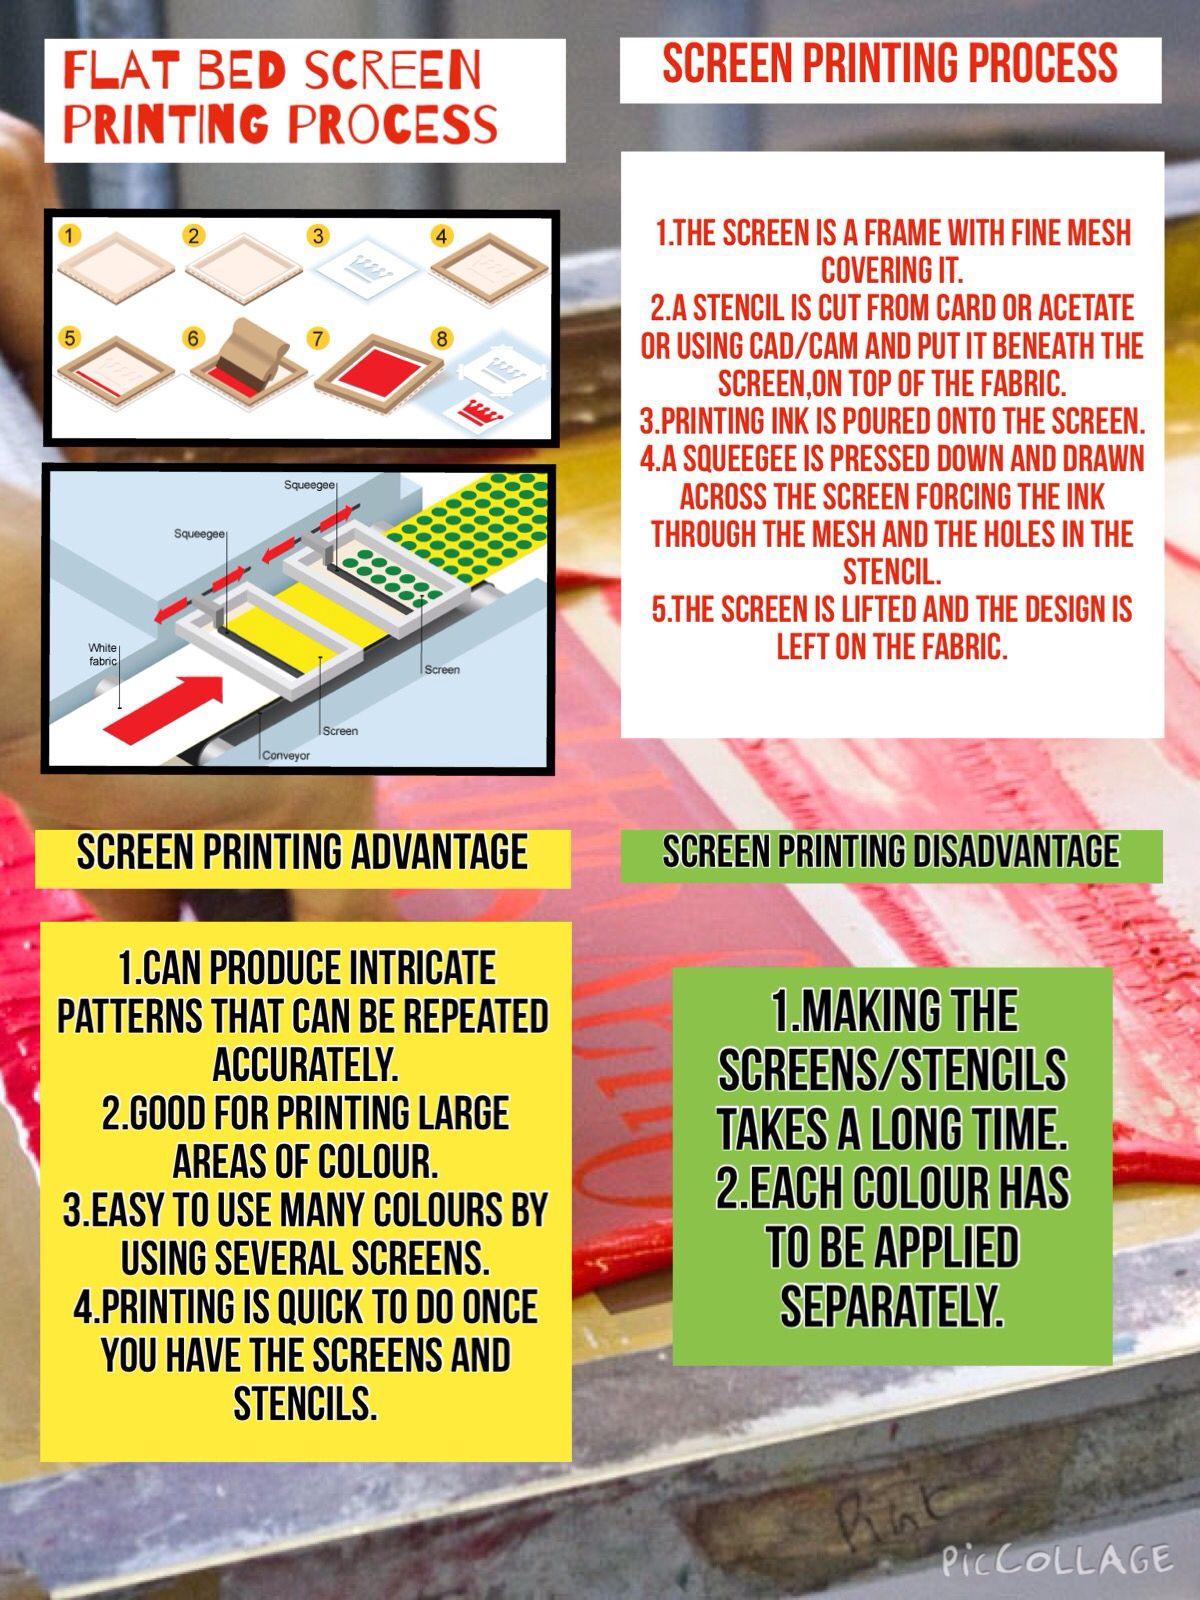 Flat Bed Screen Printing Process